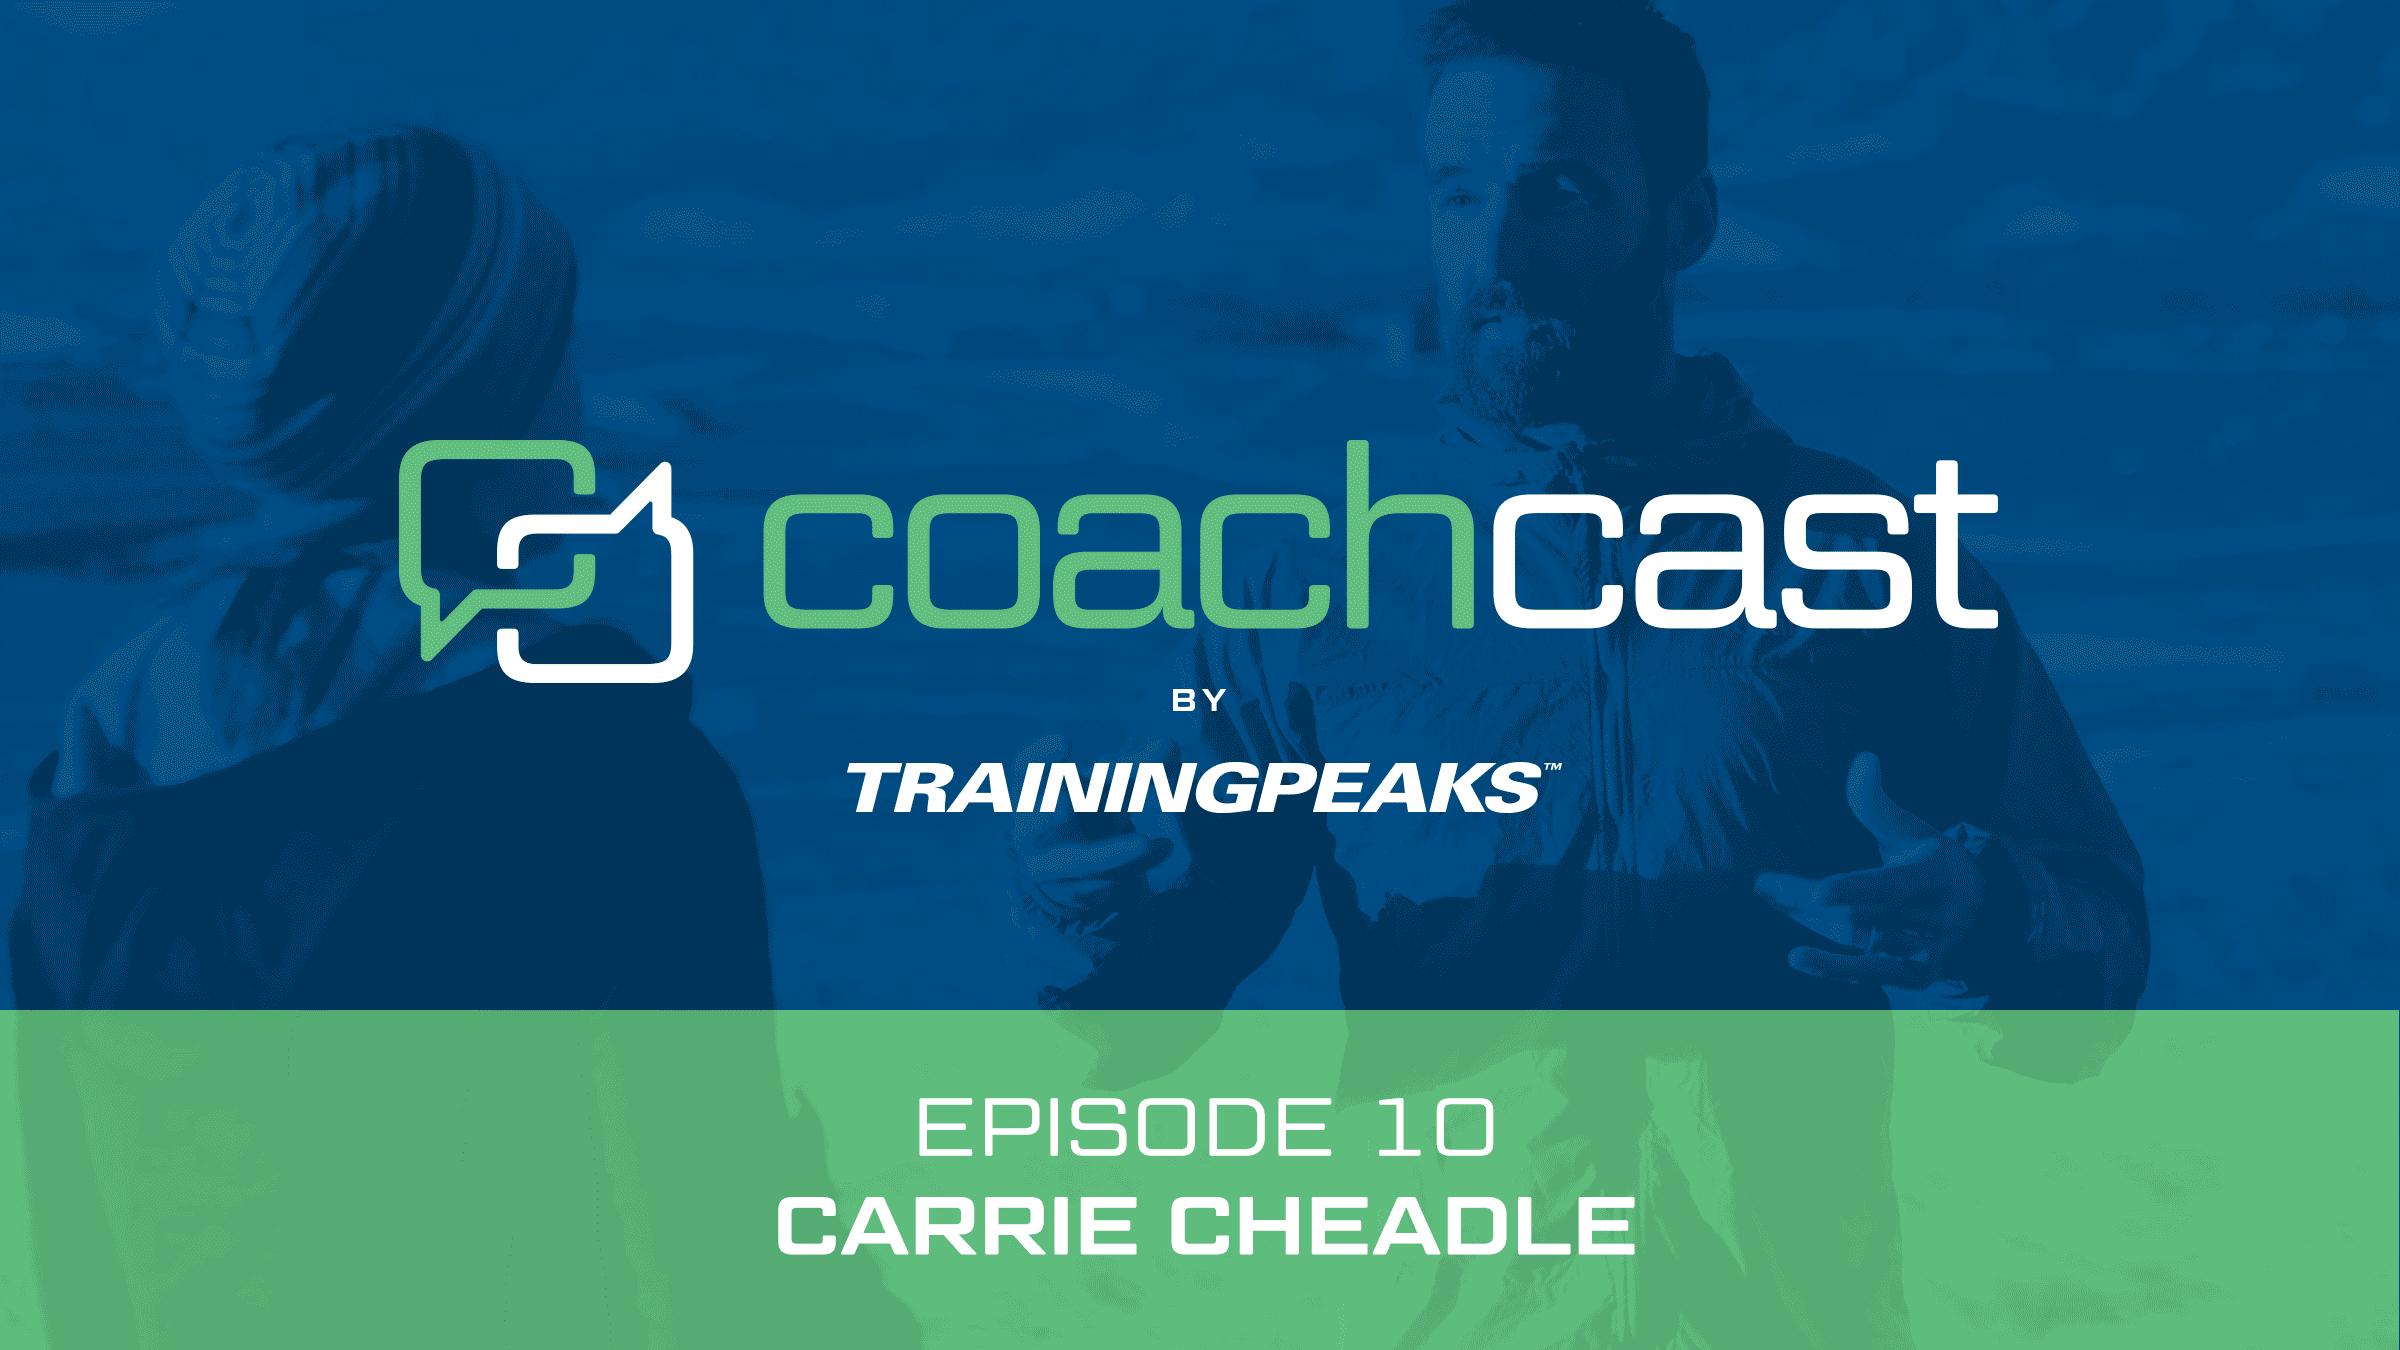 CoachCast: Secret Goals with Carrie Cheadle